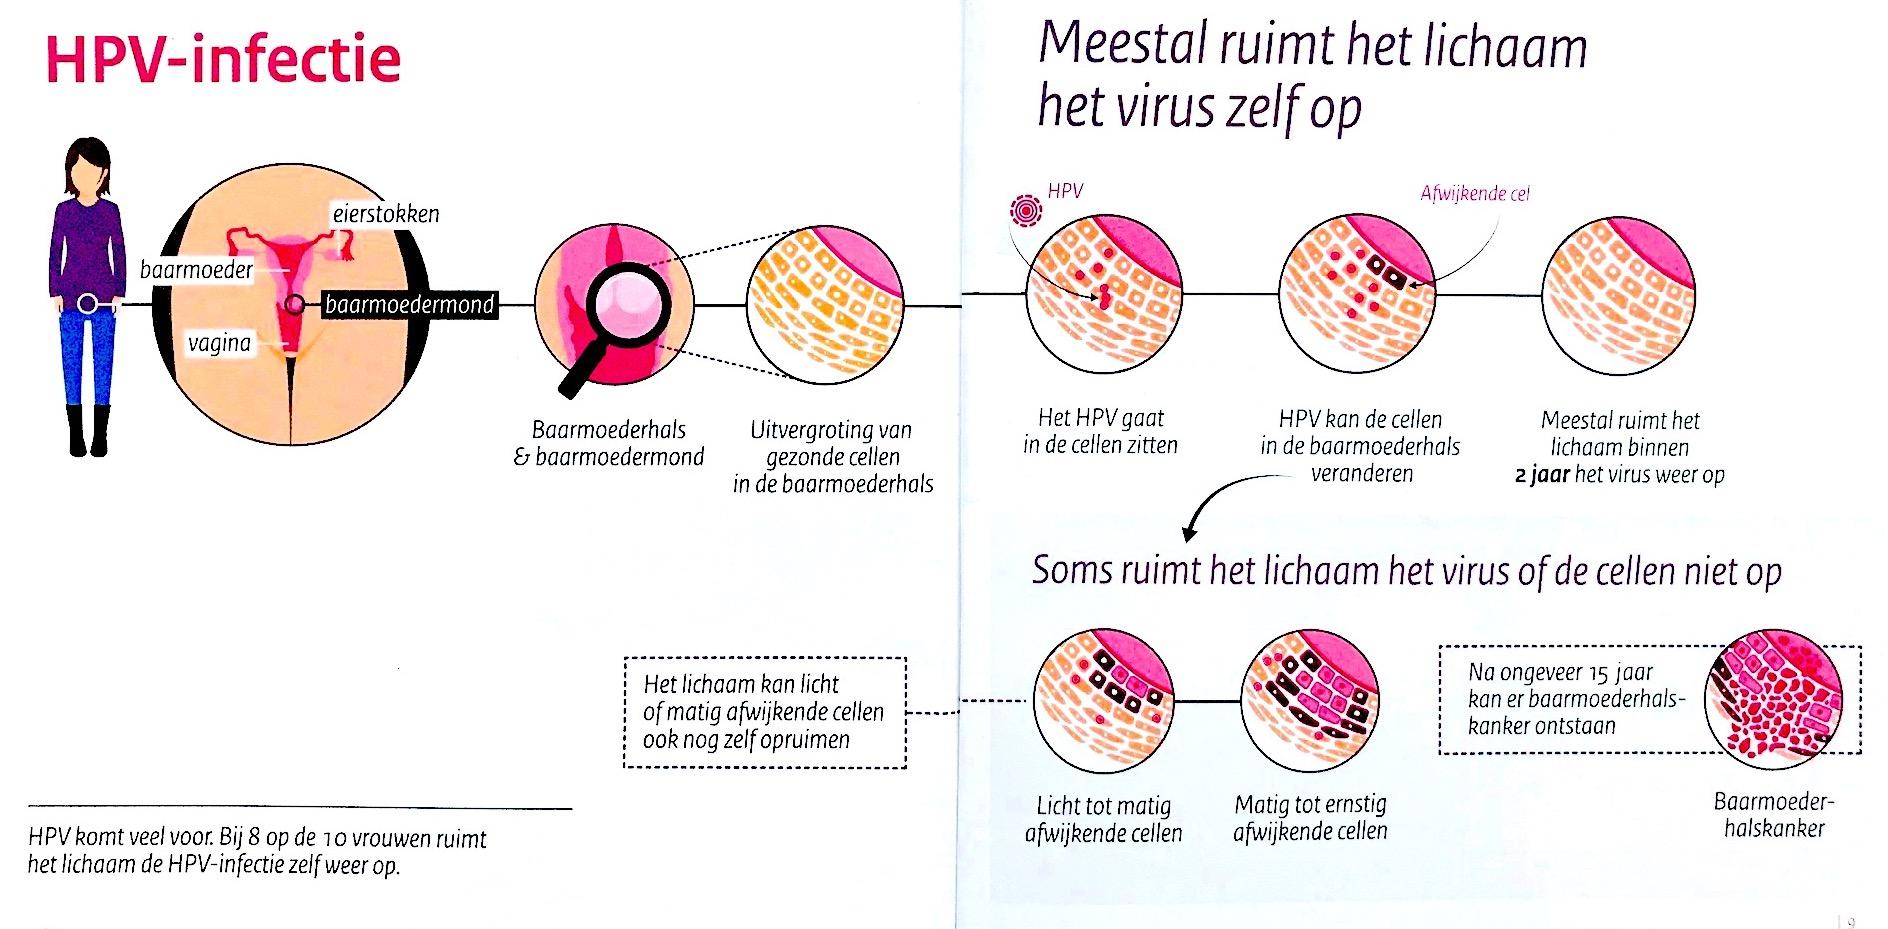 hpv vírus uit lichaam